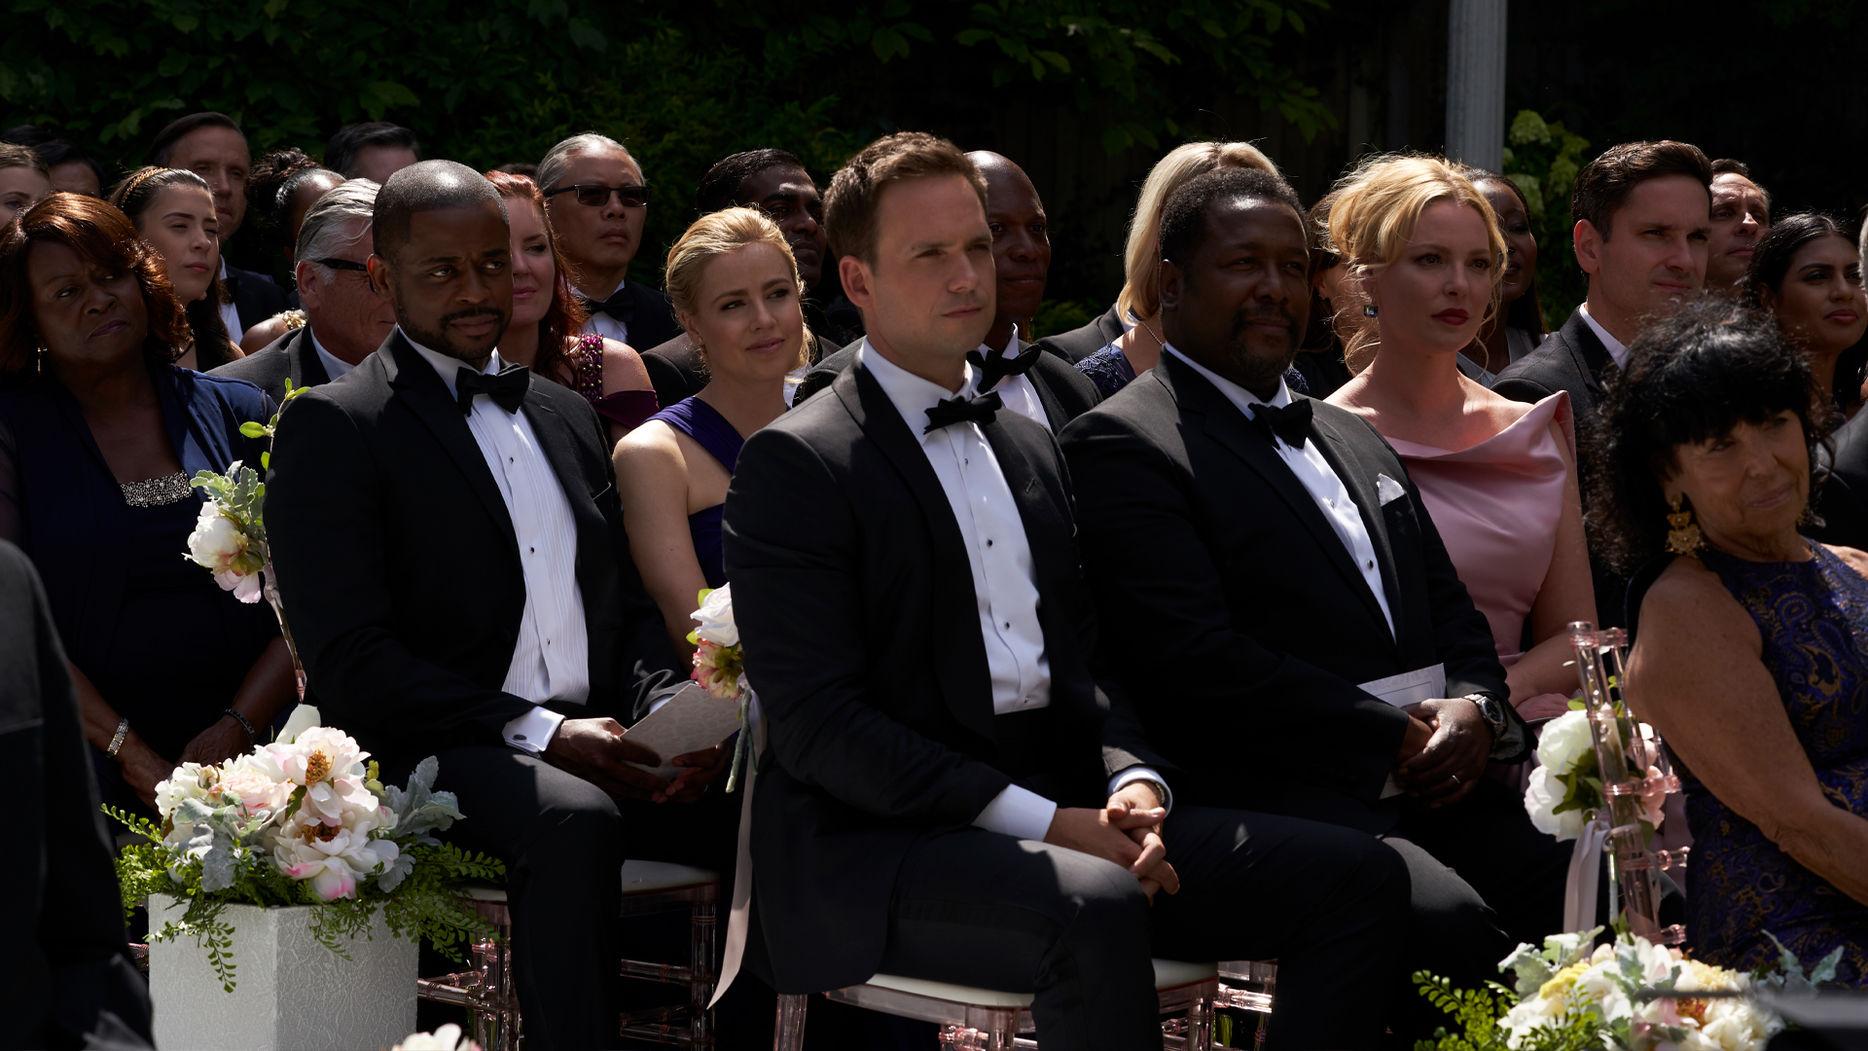 Suits S09E10 finale (78) Suits_gallery_910_DuleHill_AmandaSchull_PatrickJAdams_WendellPierce_KatherineHeigl_25_1920x1080